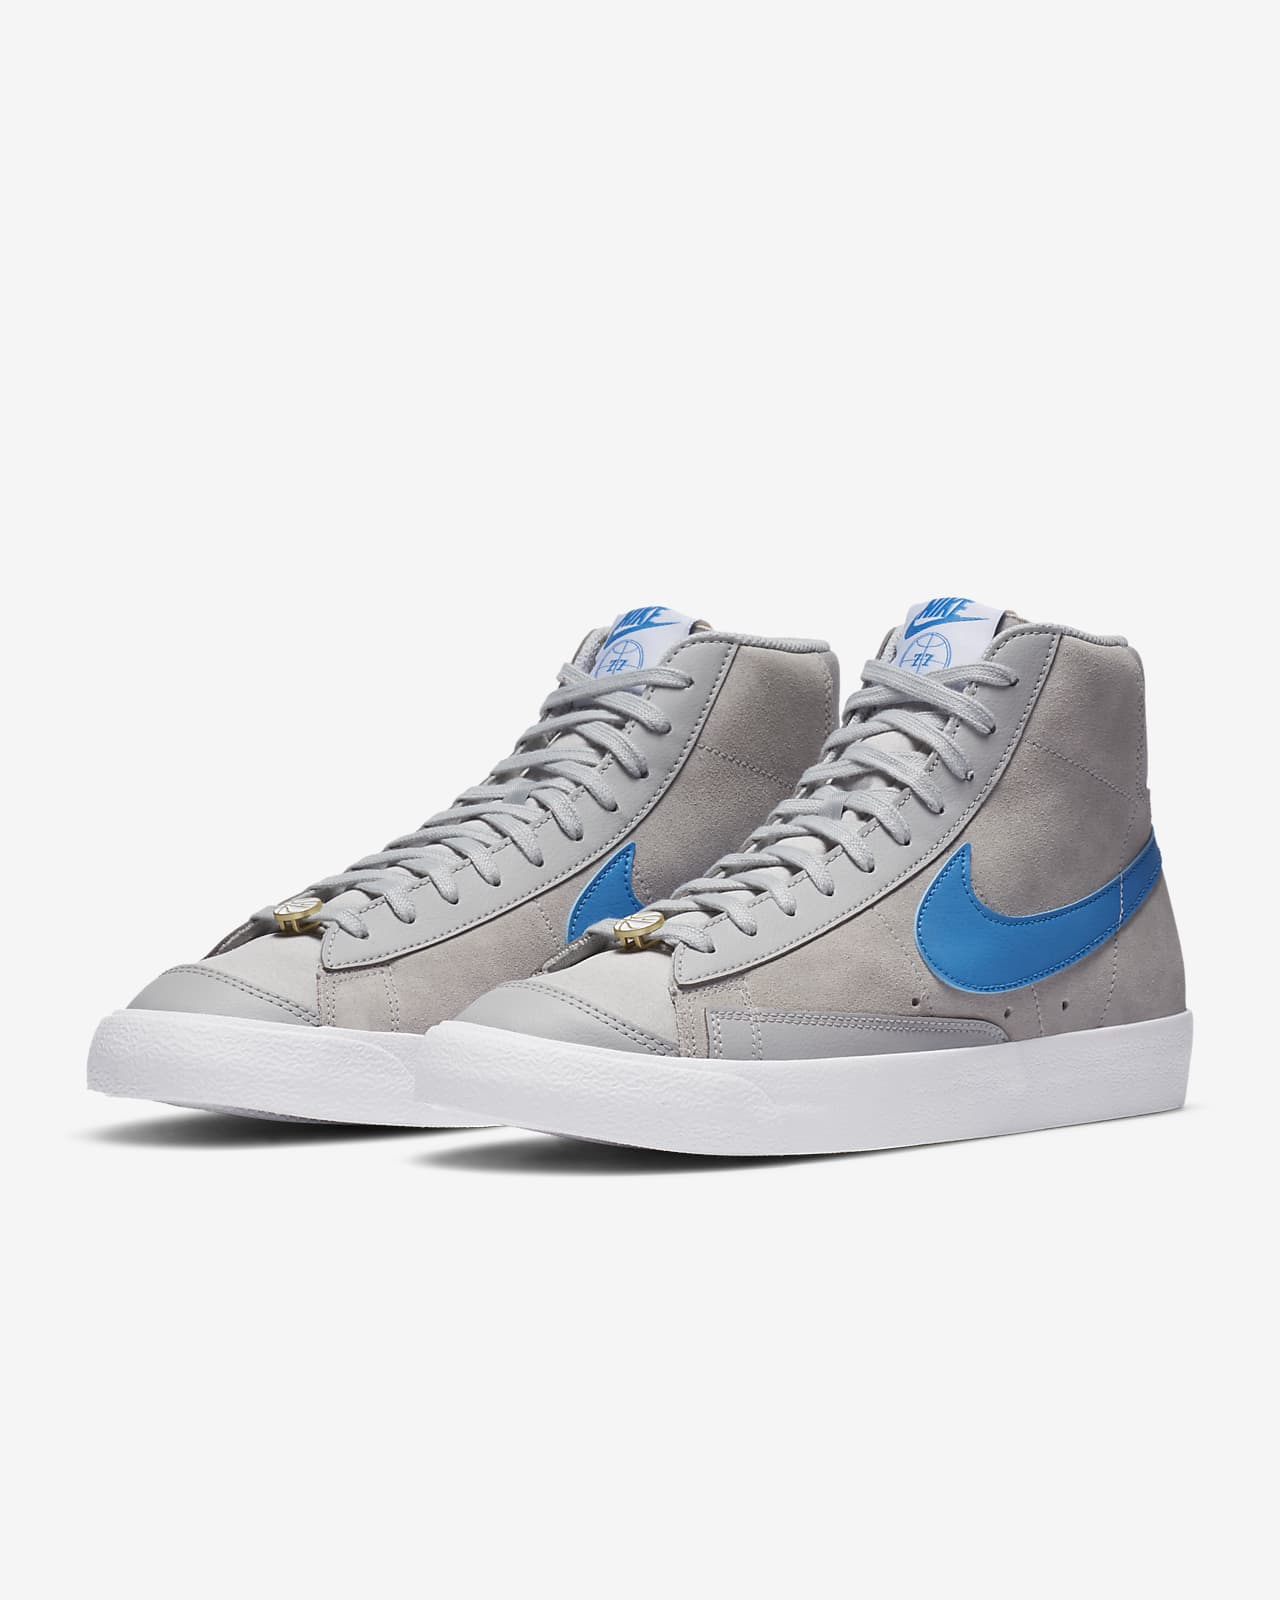 Nike Blazer Mid '77 NRG Men's Shoe. Nike SG